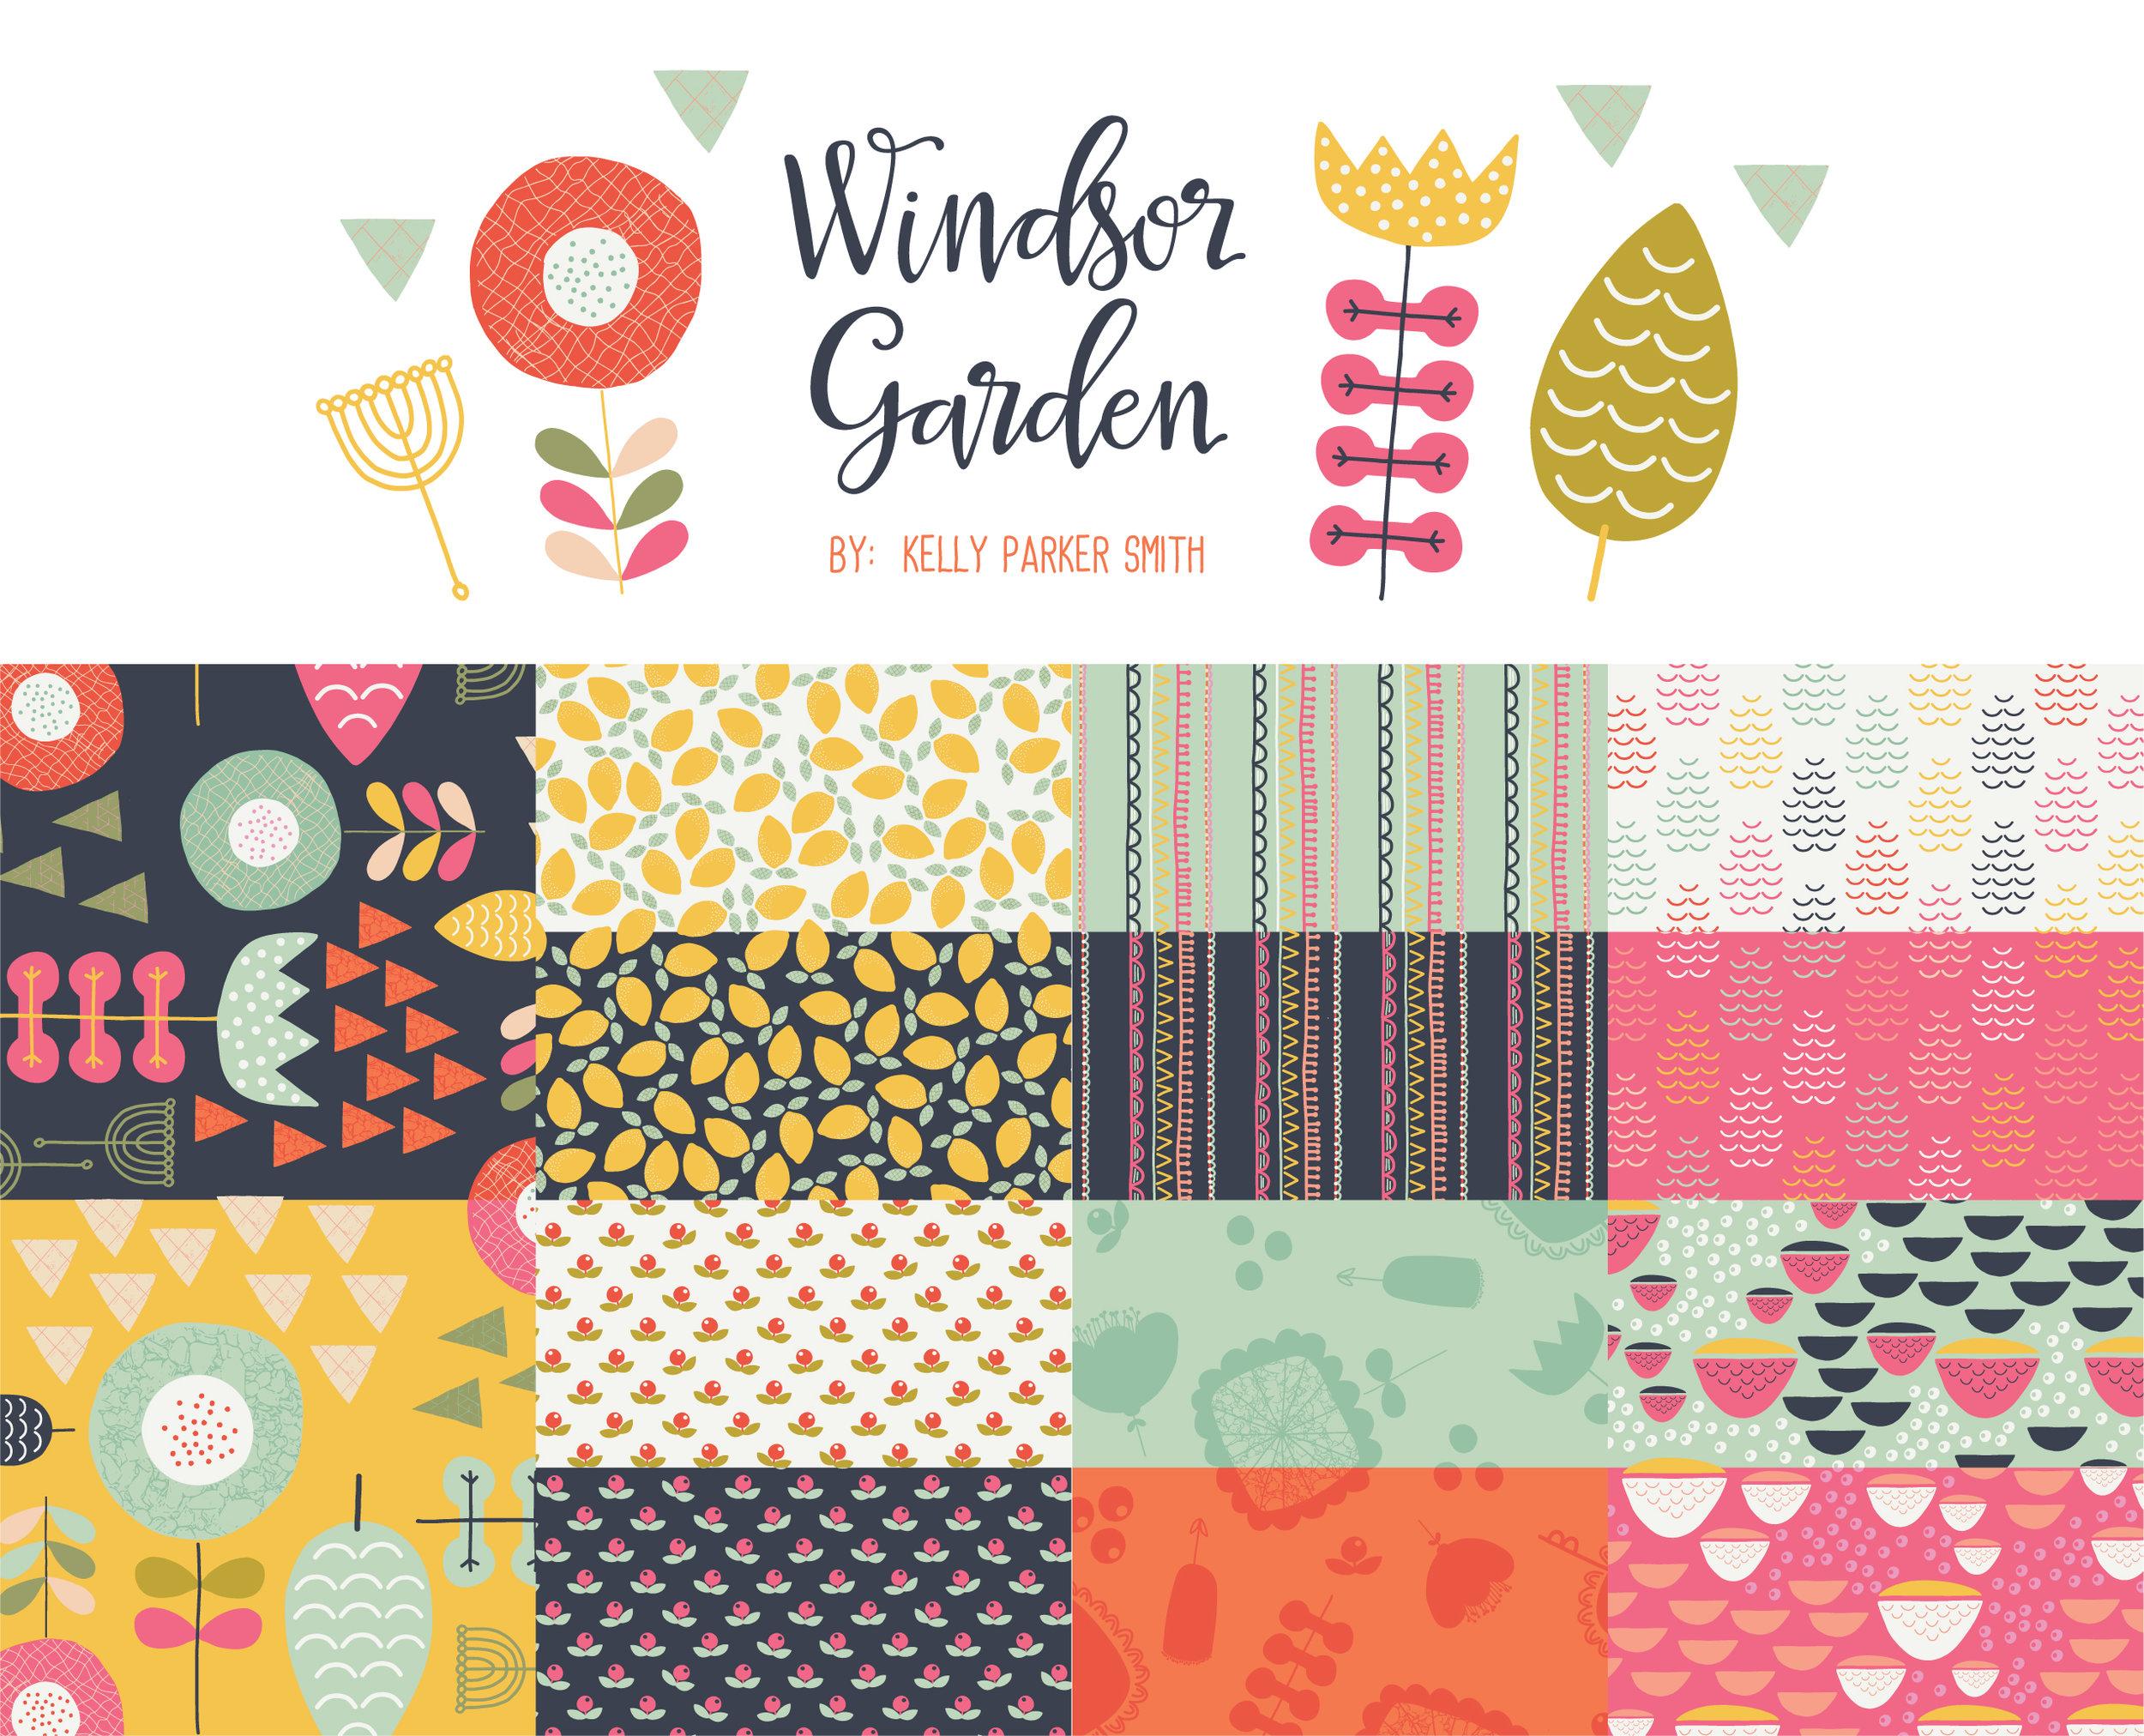 windsor garden blog post cover_Artboard 2.jpg